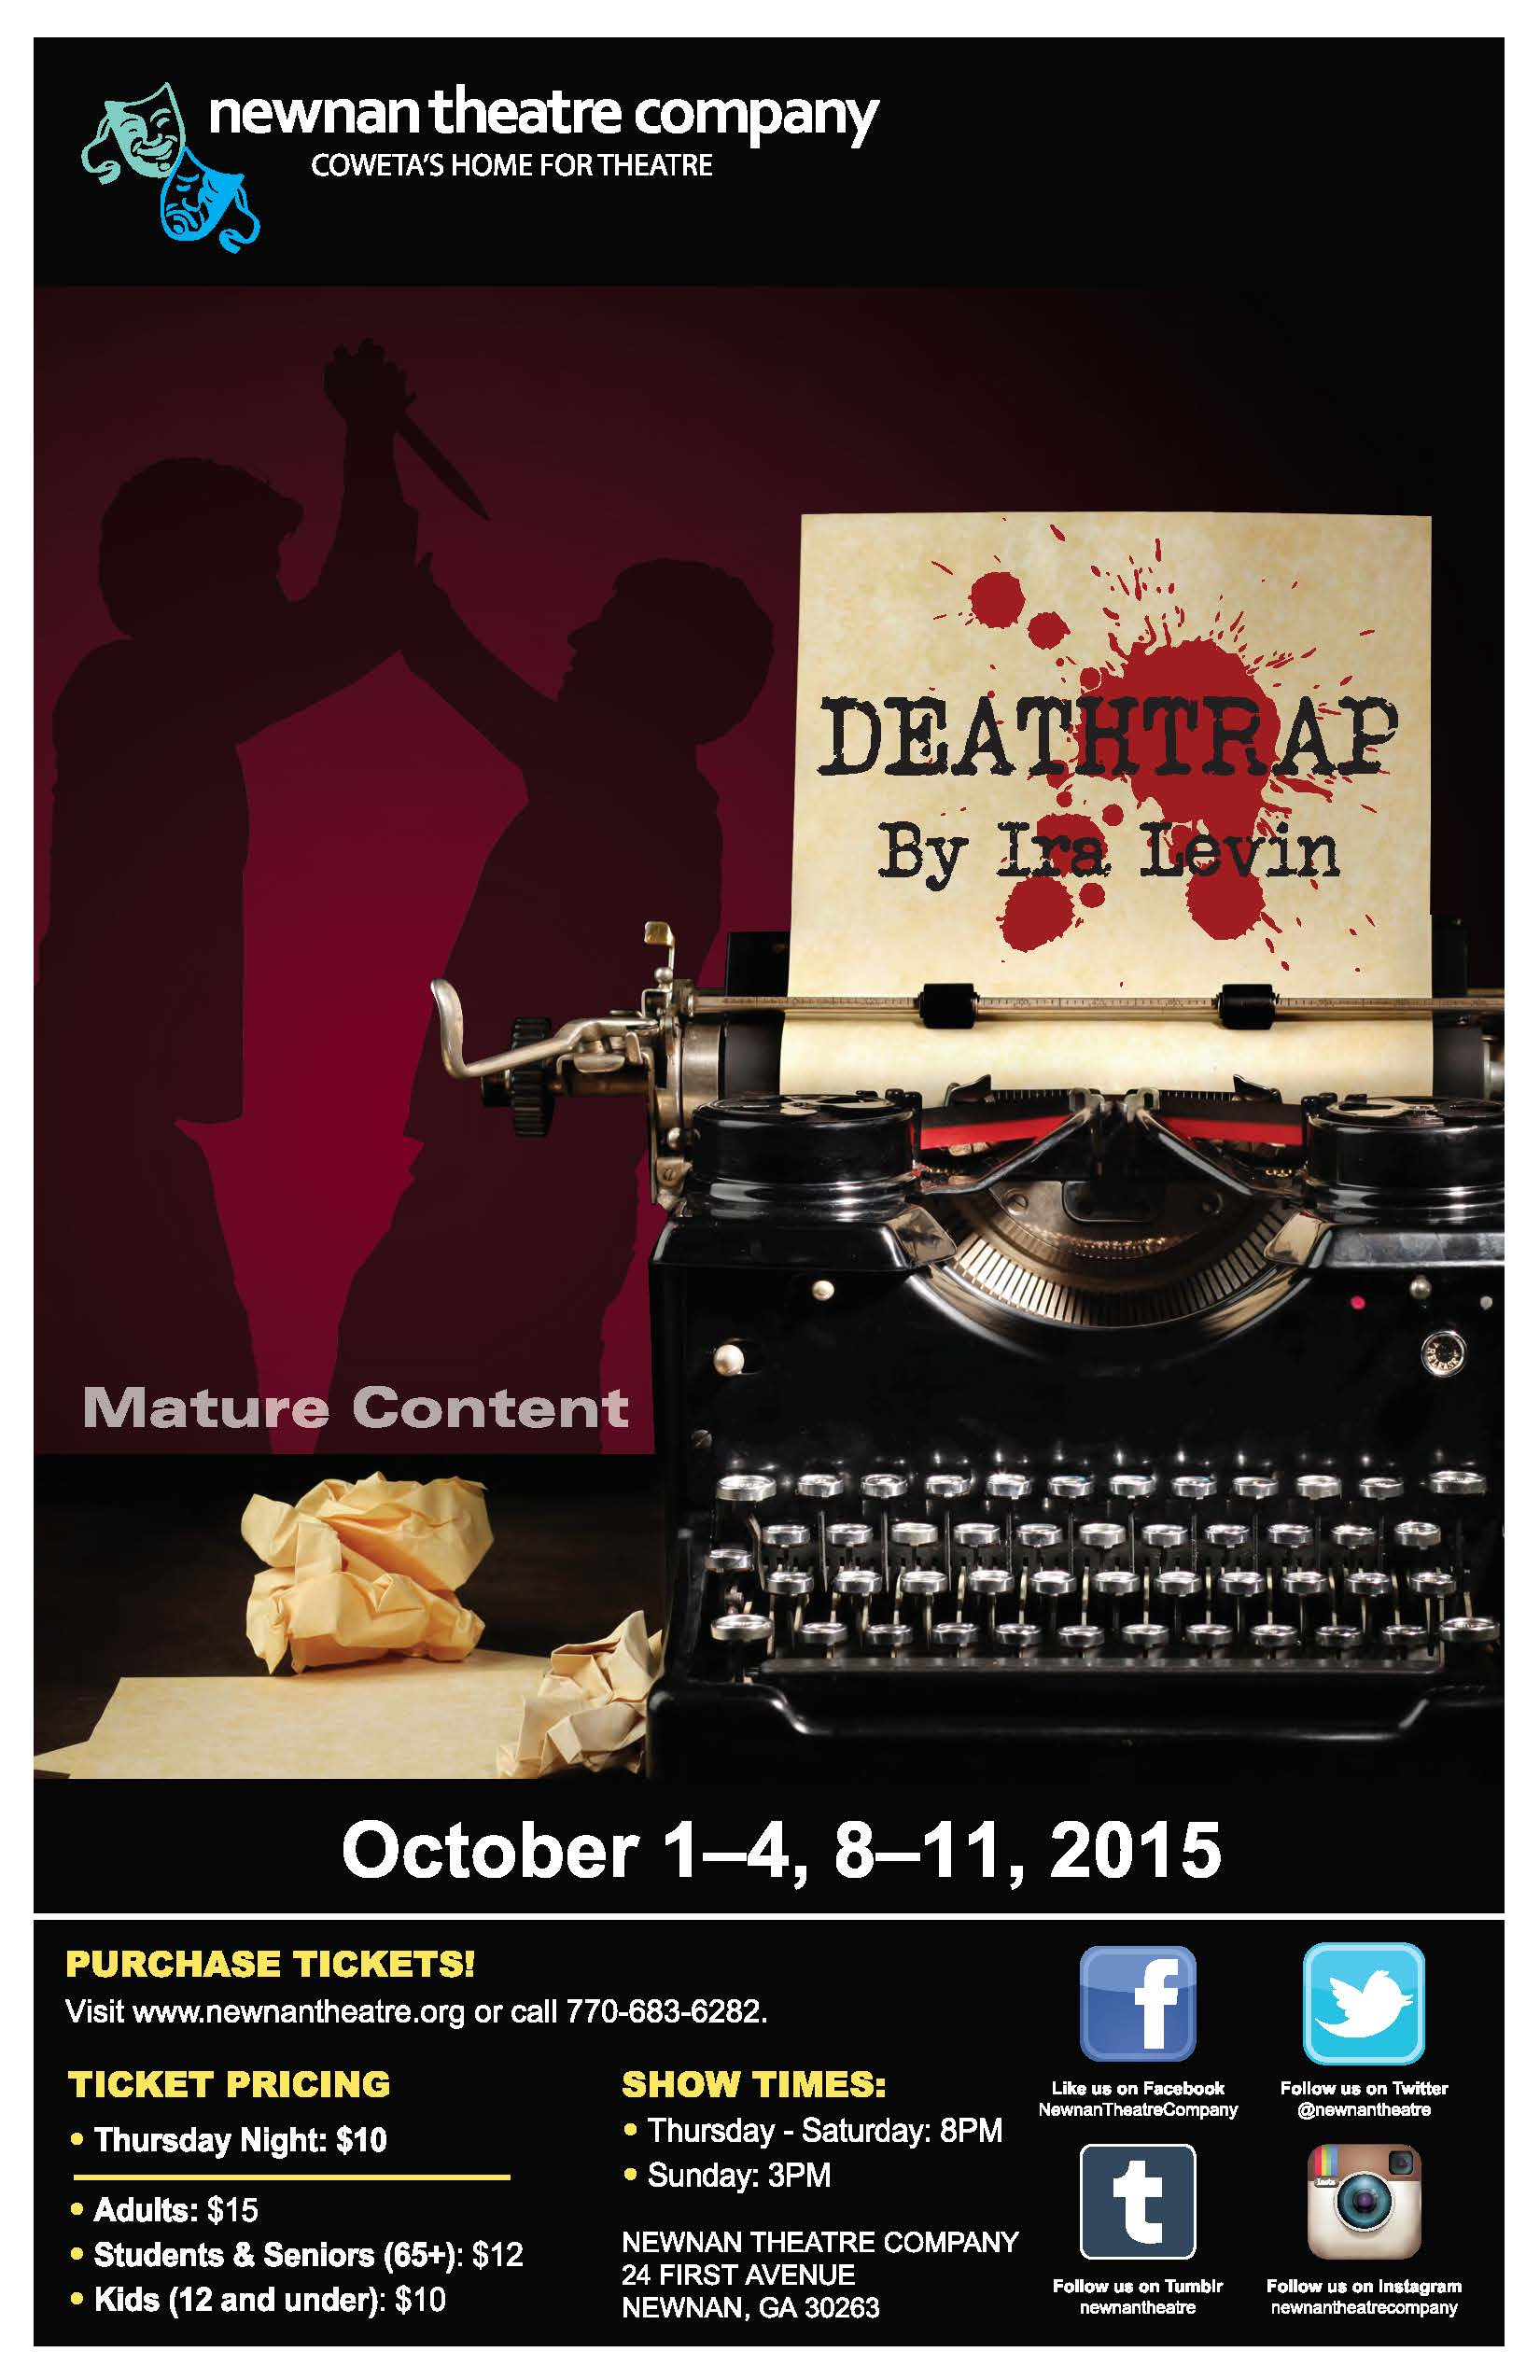 Deathtrap_11x17 poster.jpg